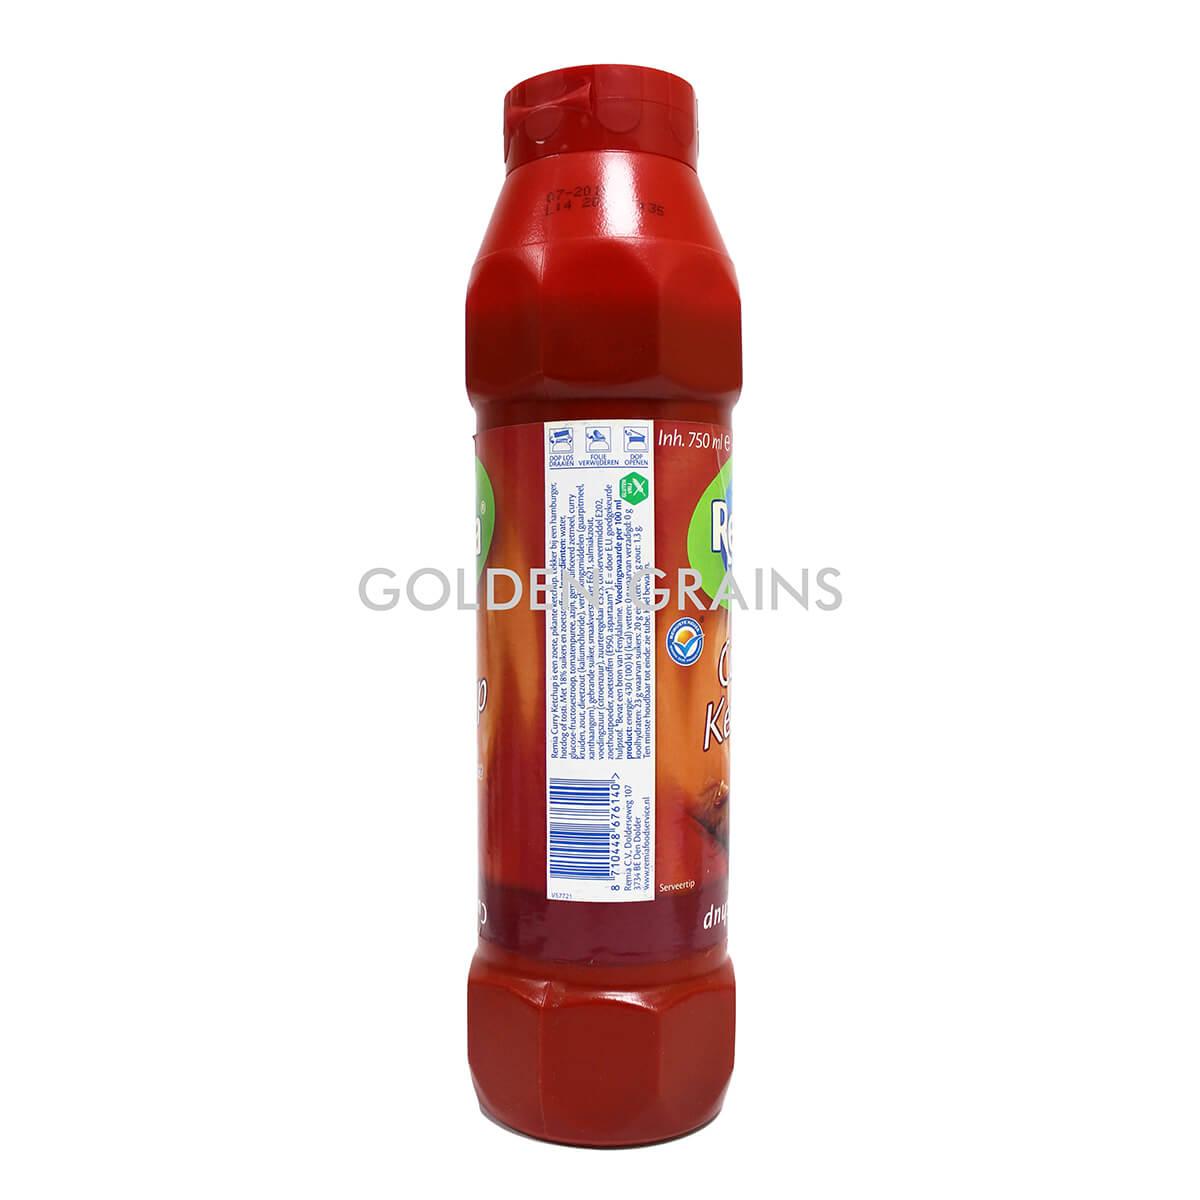 Golden Grains Dubai Export - Remia - Curry Ketchup - Side.jpg